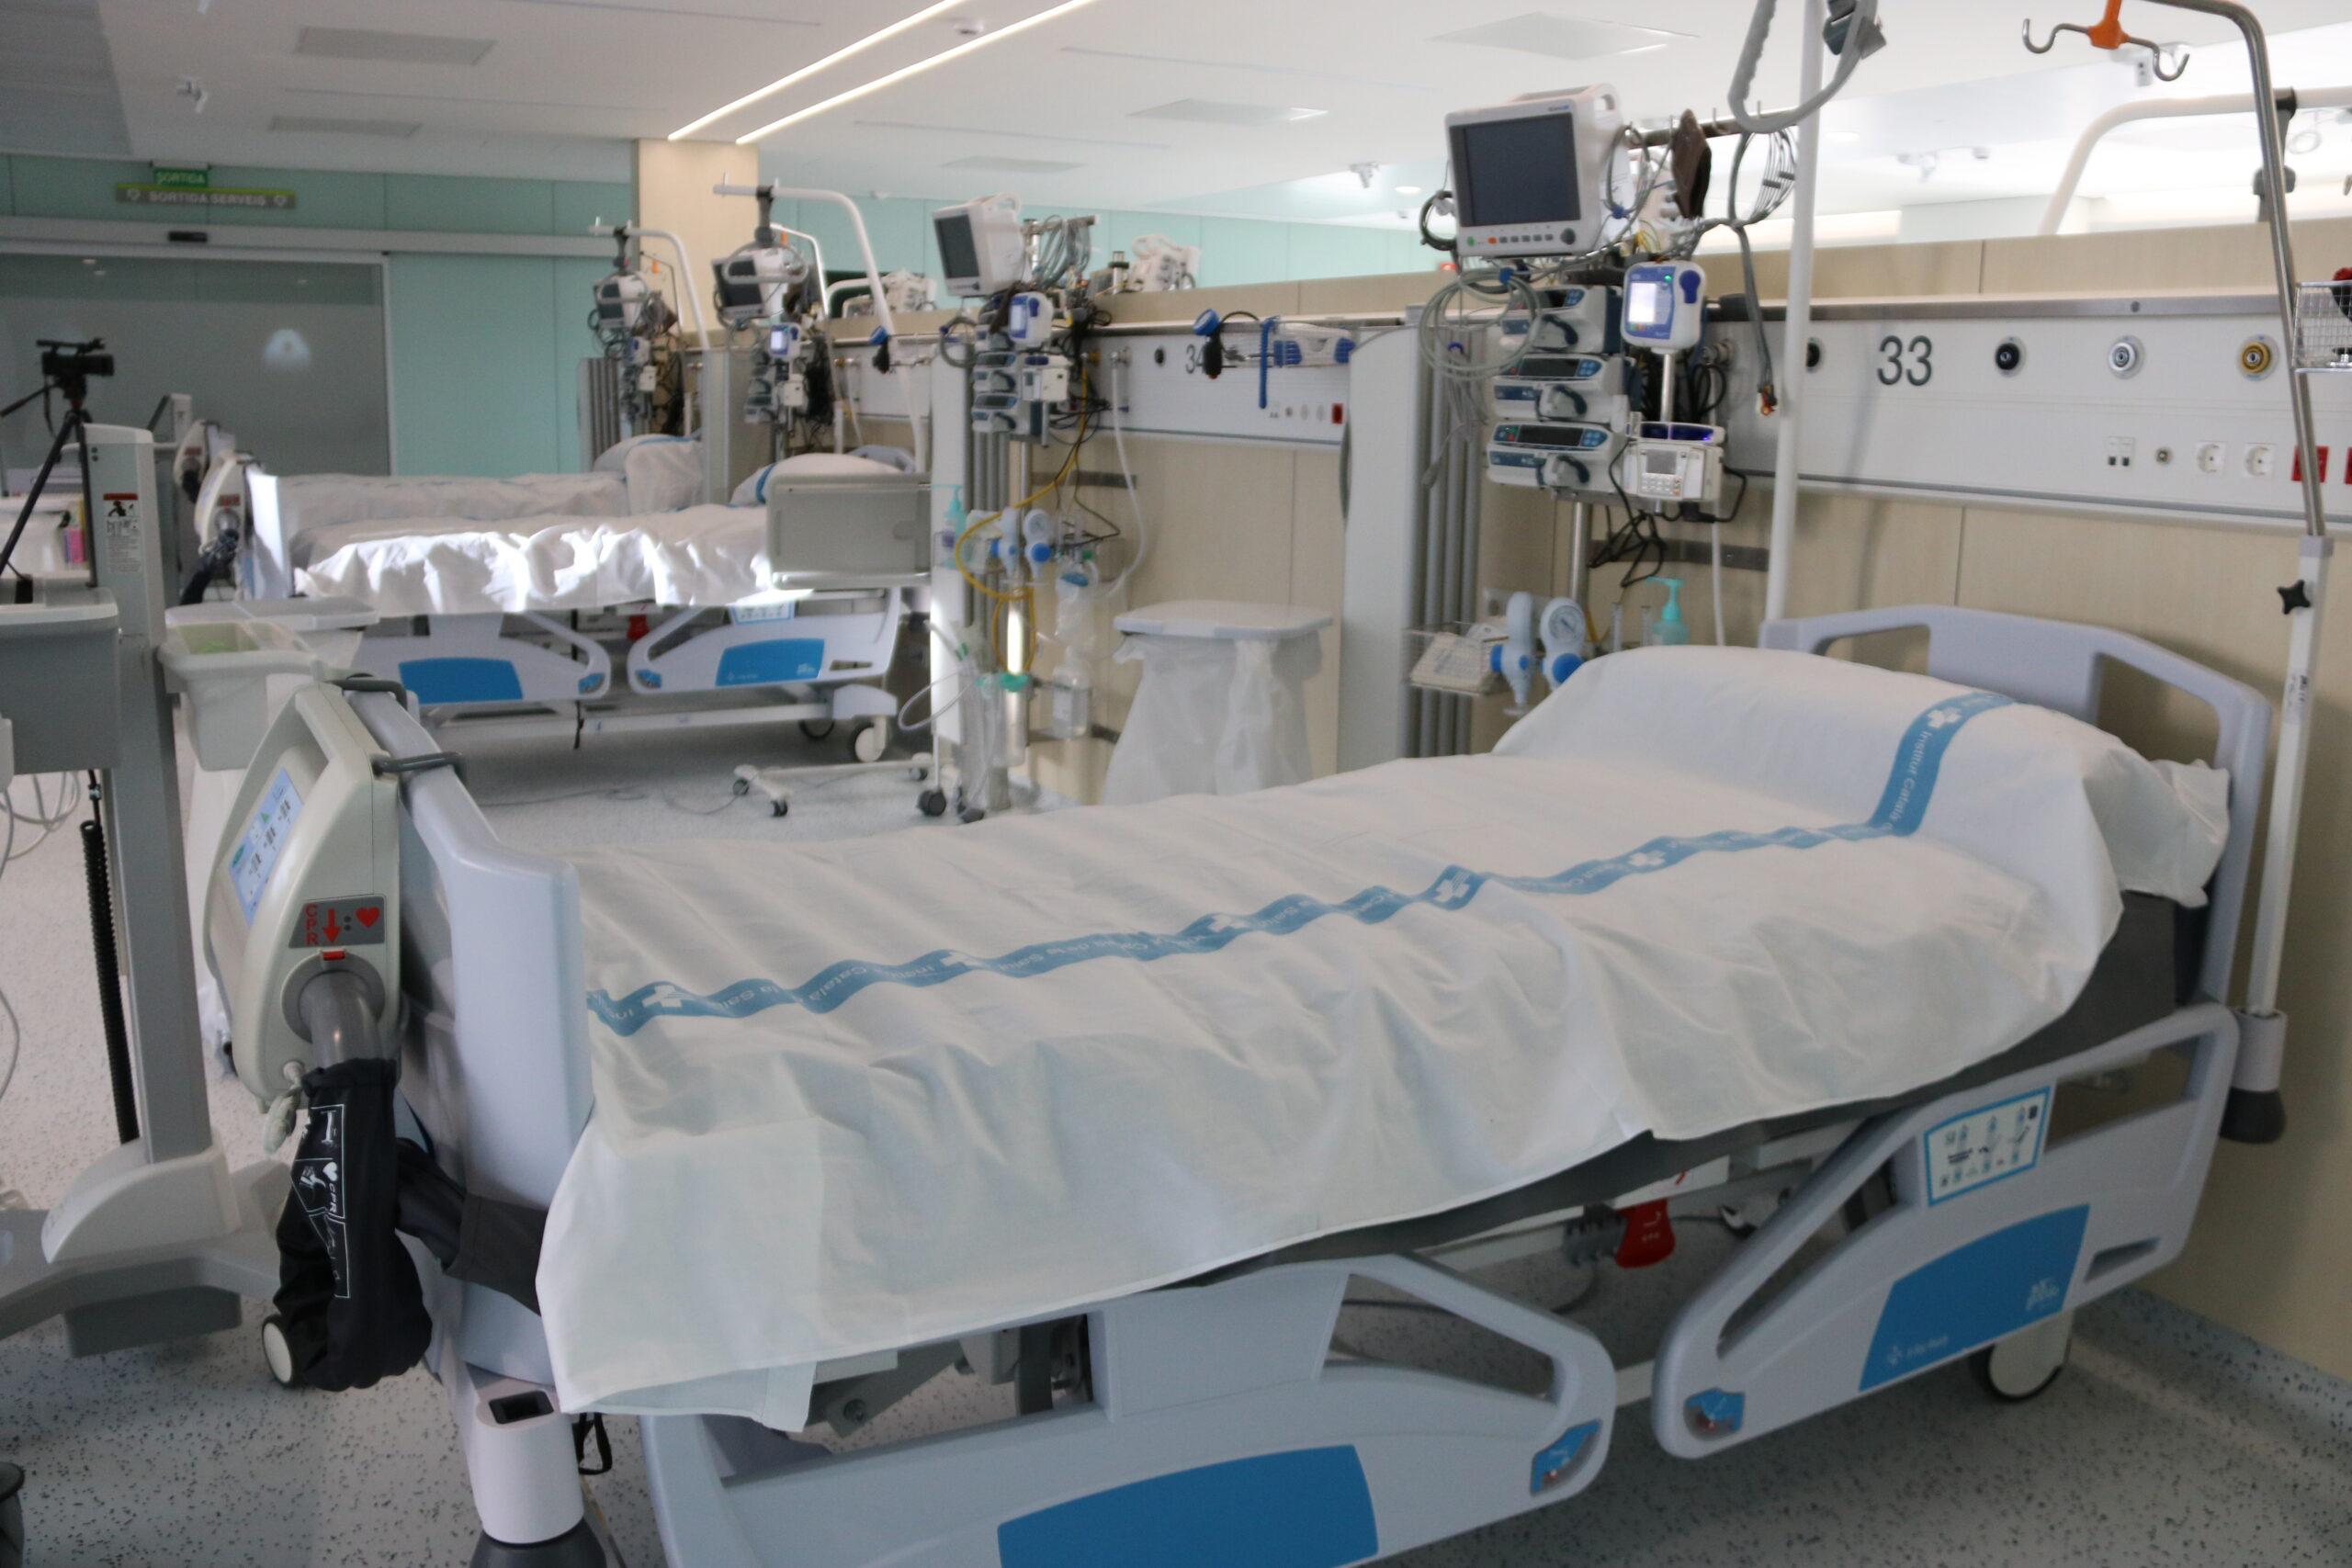 Llits al nou espai annex a l'hospital Germans Trias i Pujol / ACN